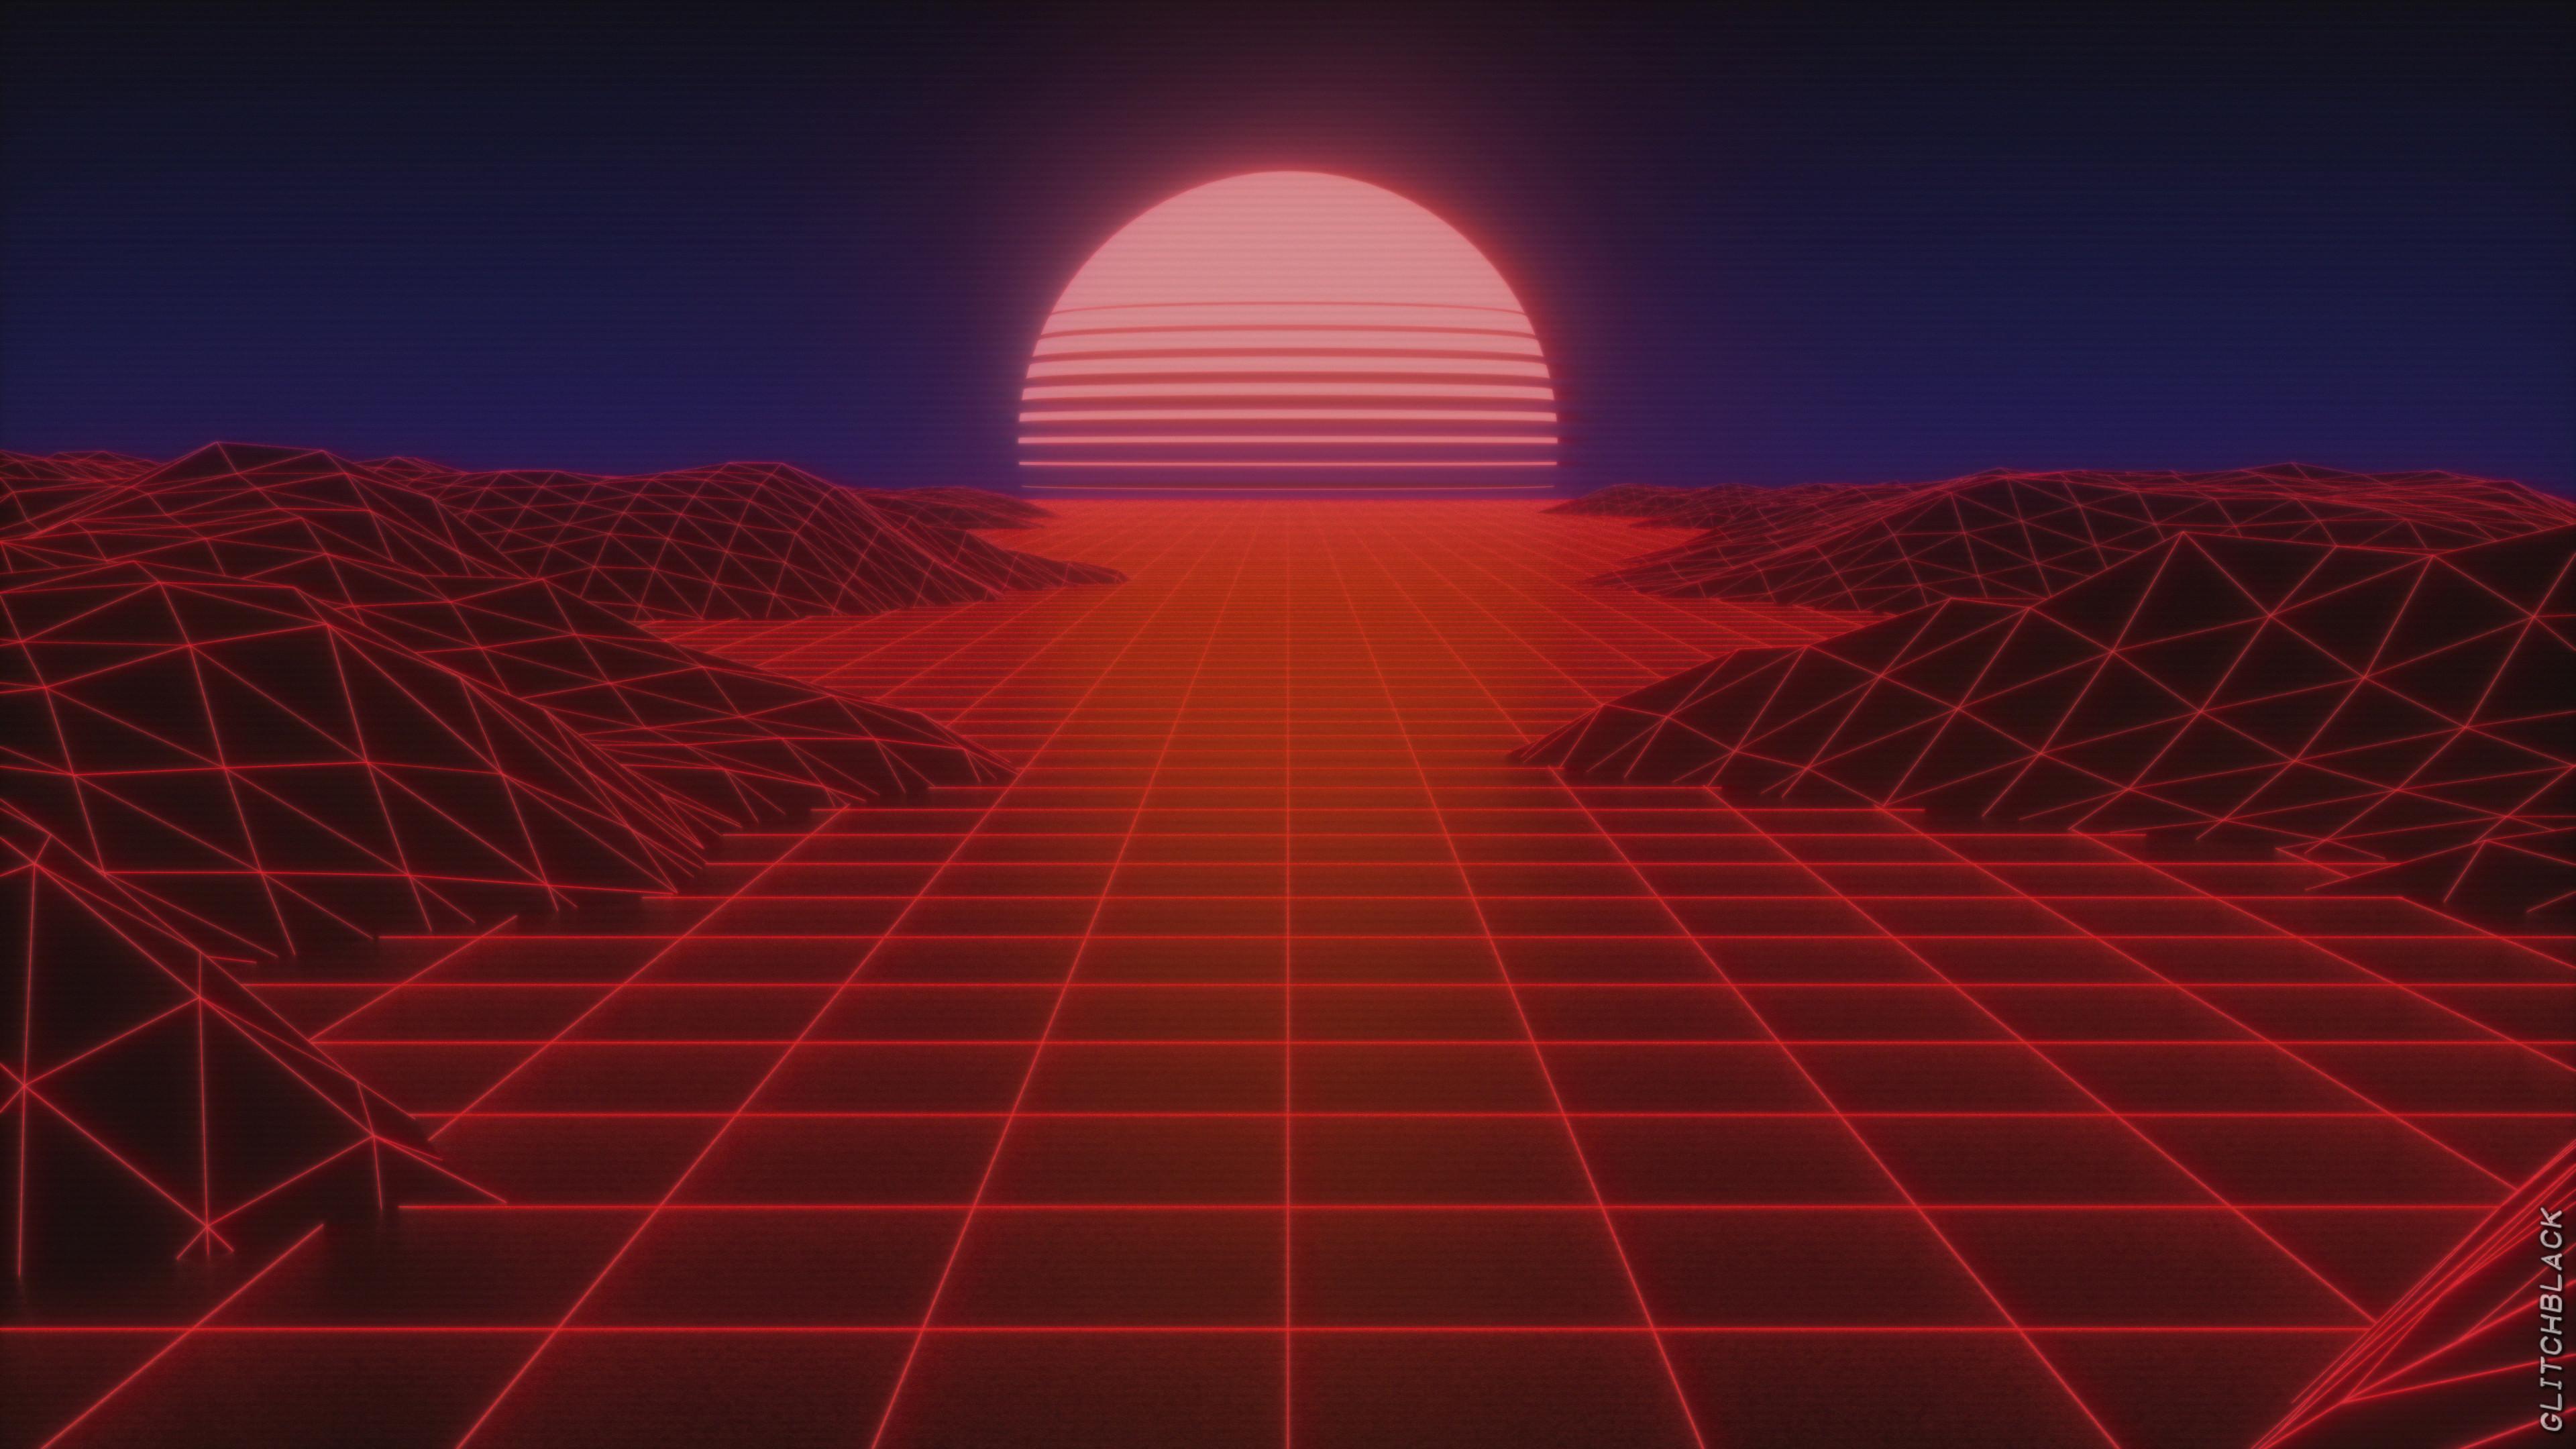 Wallpaper Synthwave Sun Vaporwave 3840x2160 Antistar